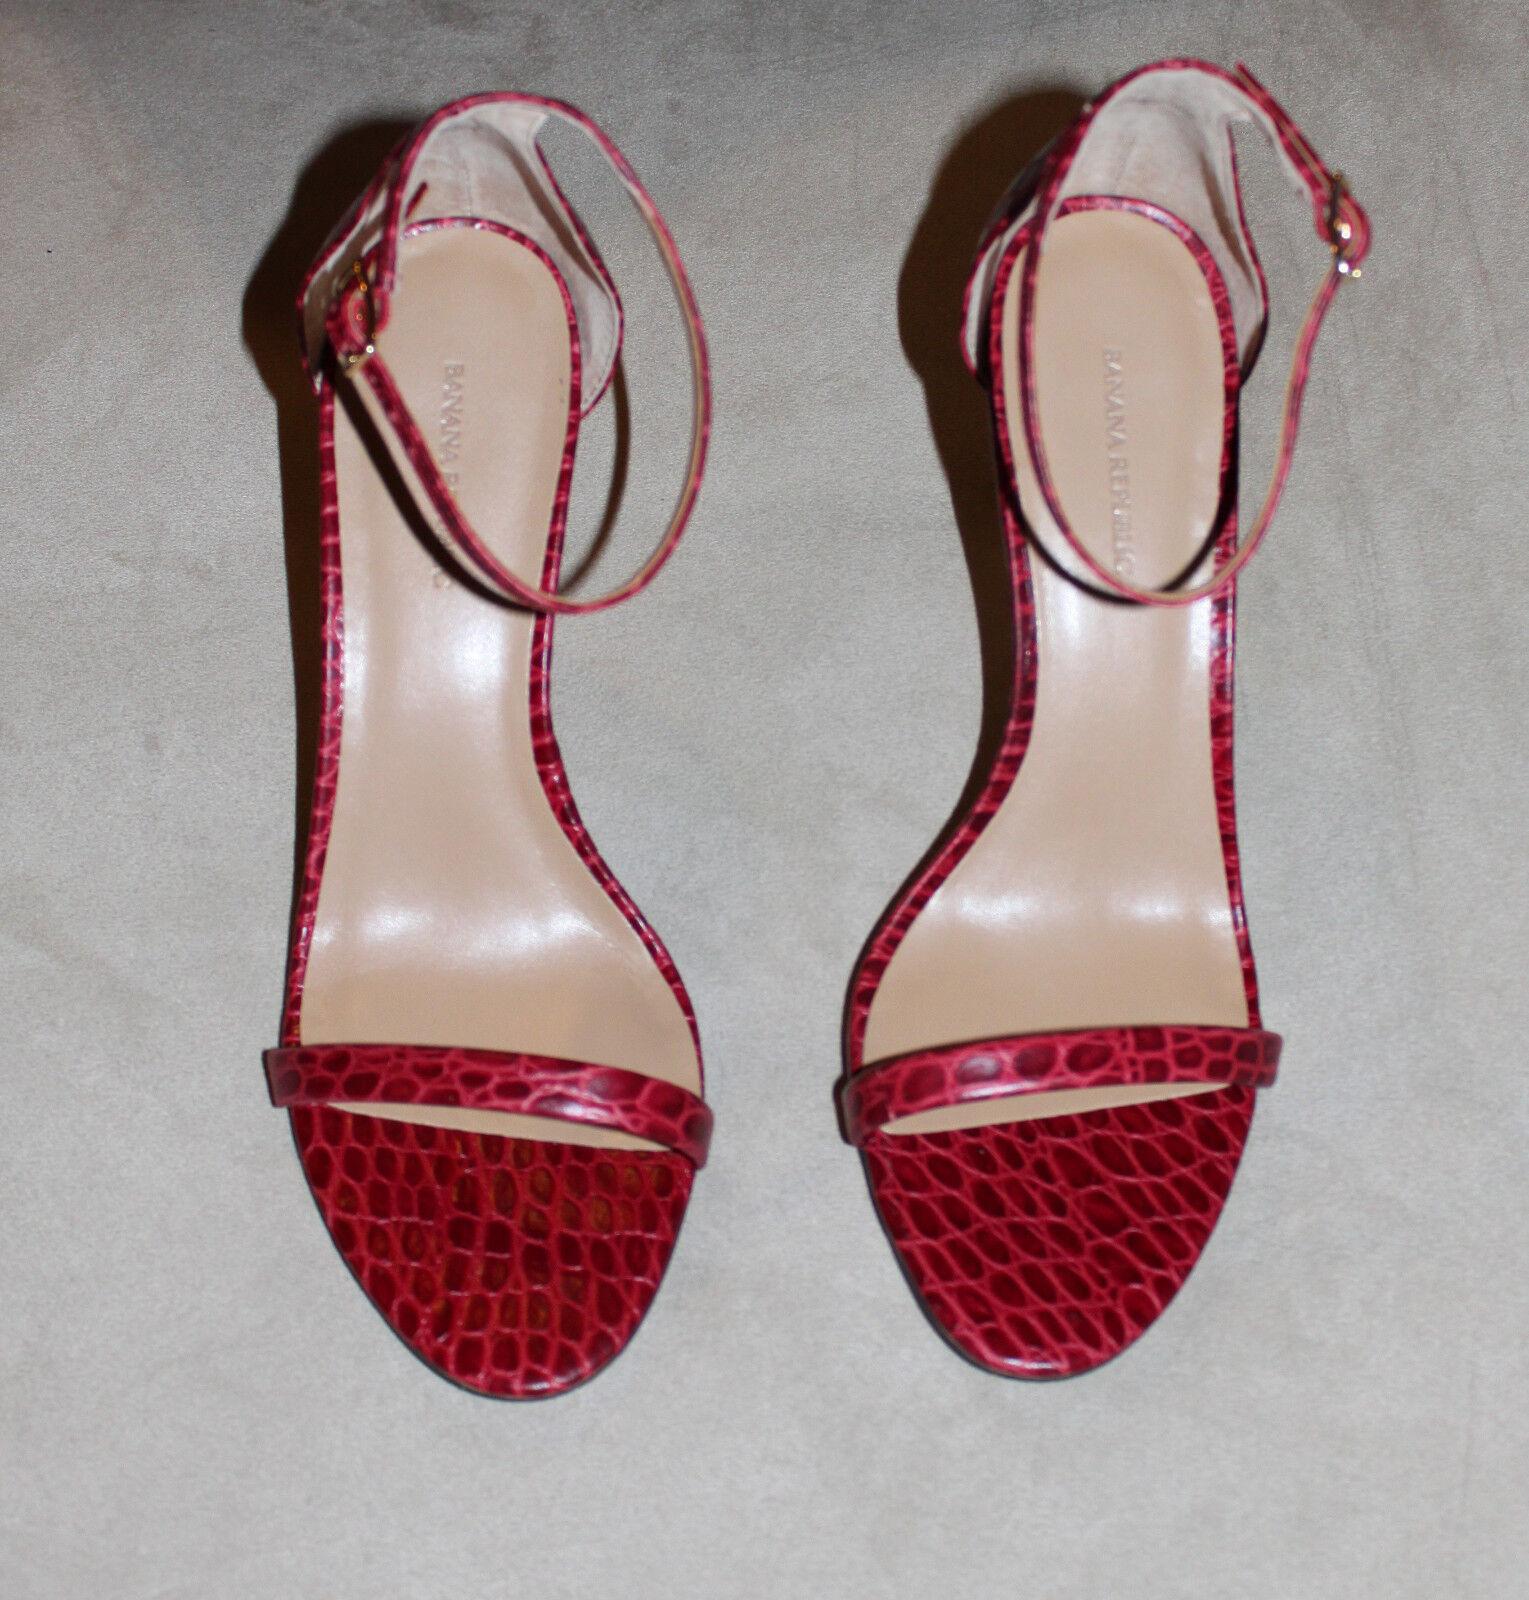 ROT Snakeskin BANANA REPUBLIC Strappy Pump High Heel Schuhes Sandales 6 9